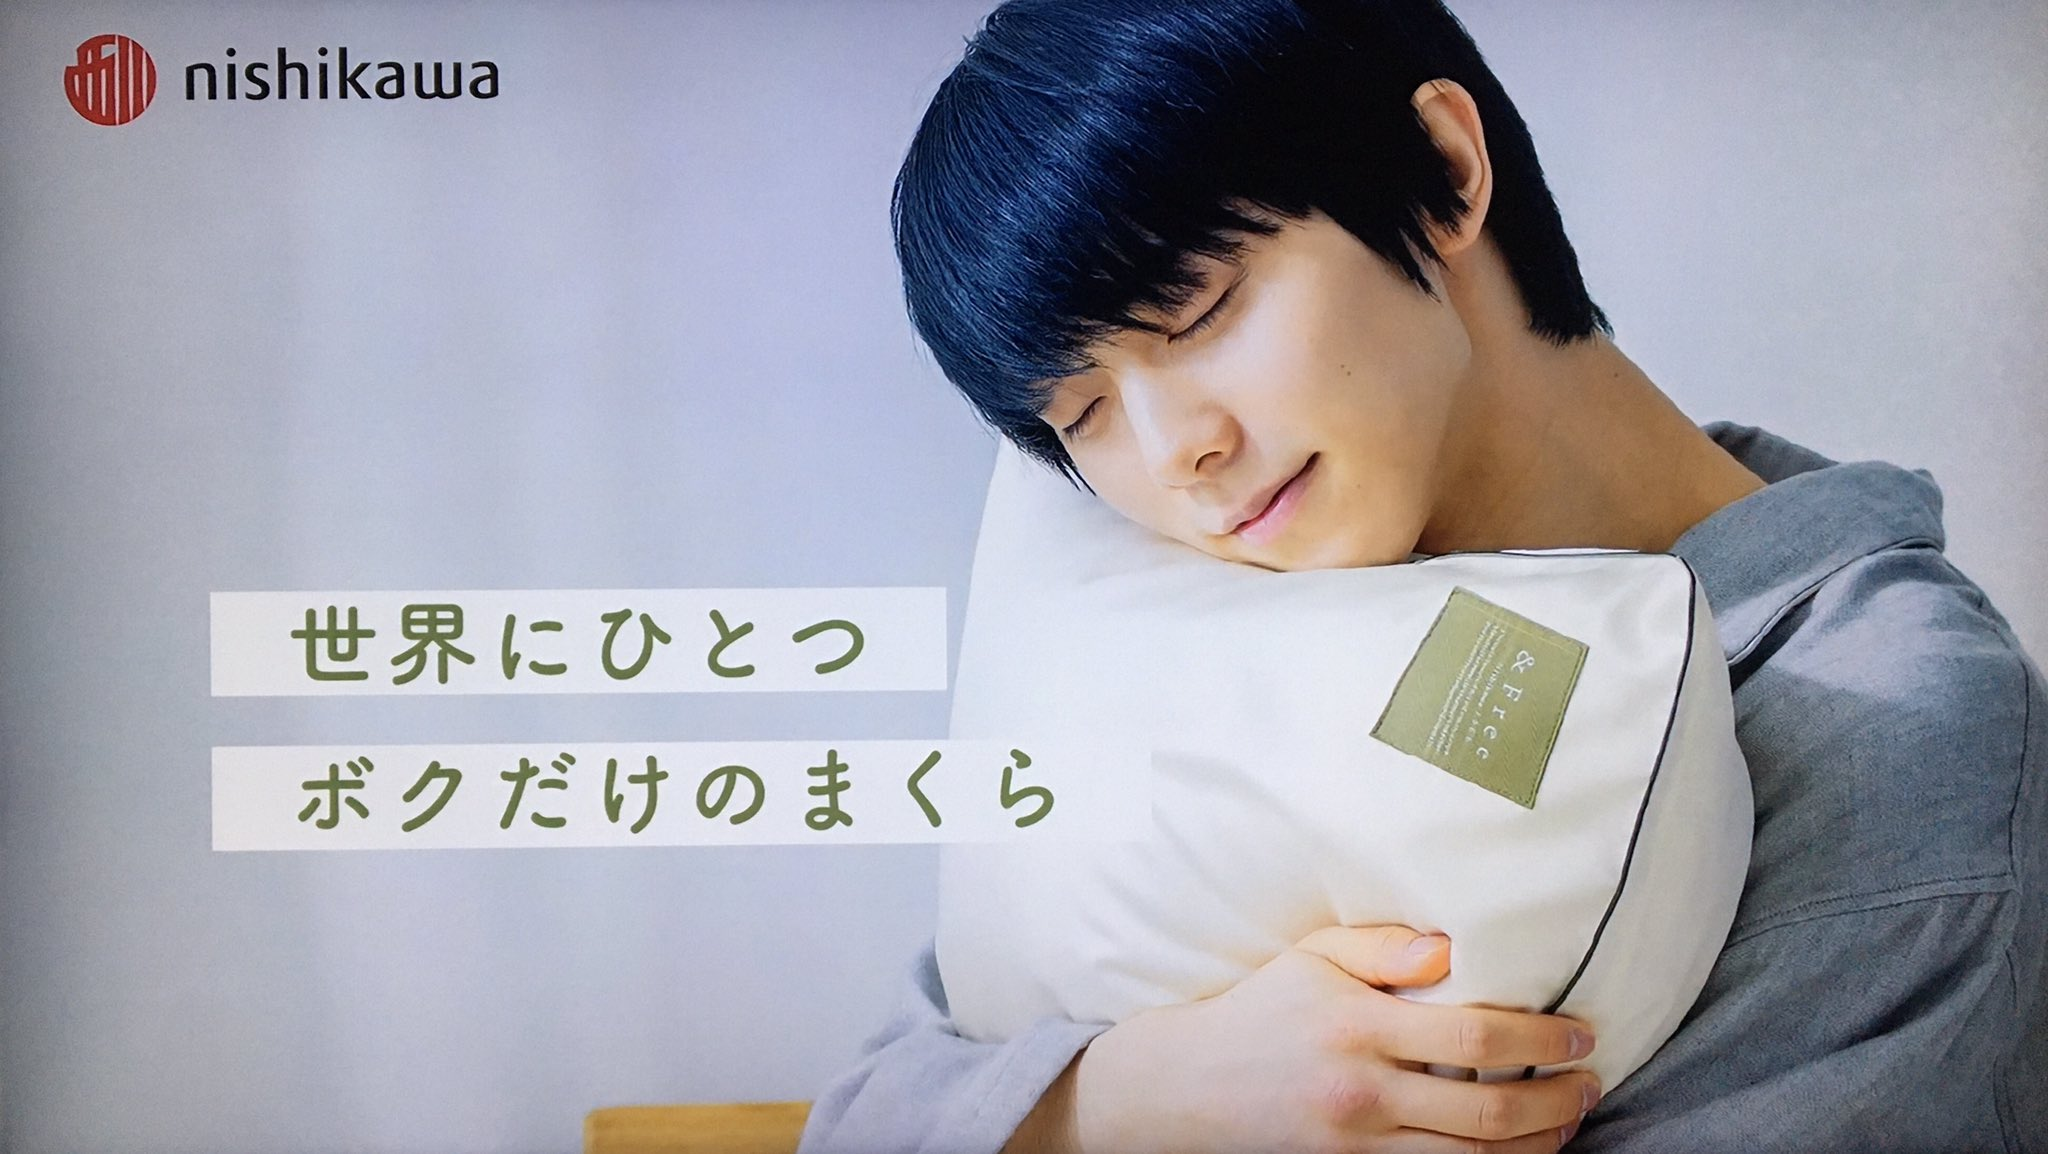 YuzuNews dal 21 al 30 settembre tokyo nishikawa &free yuzuru hanyu